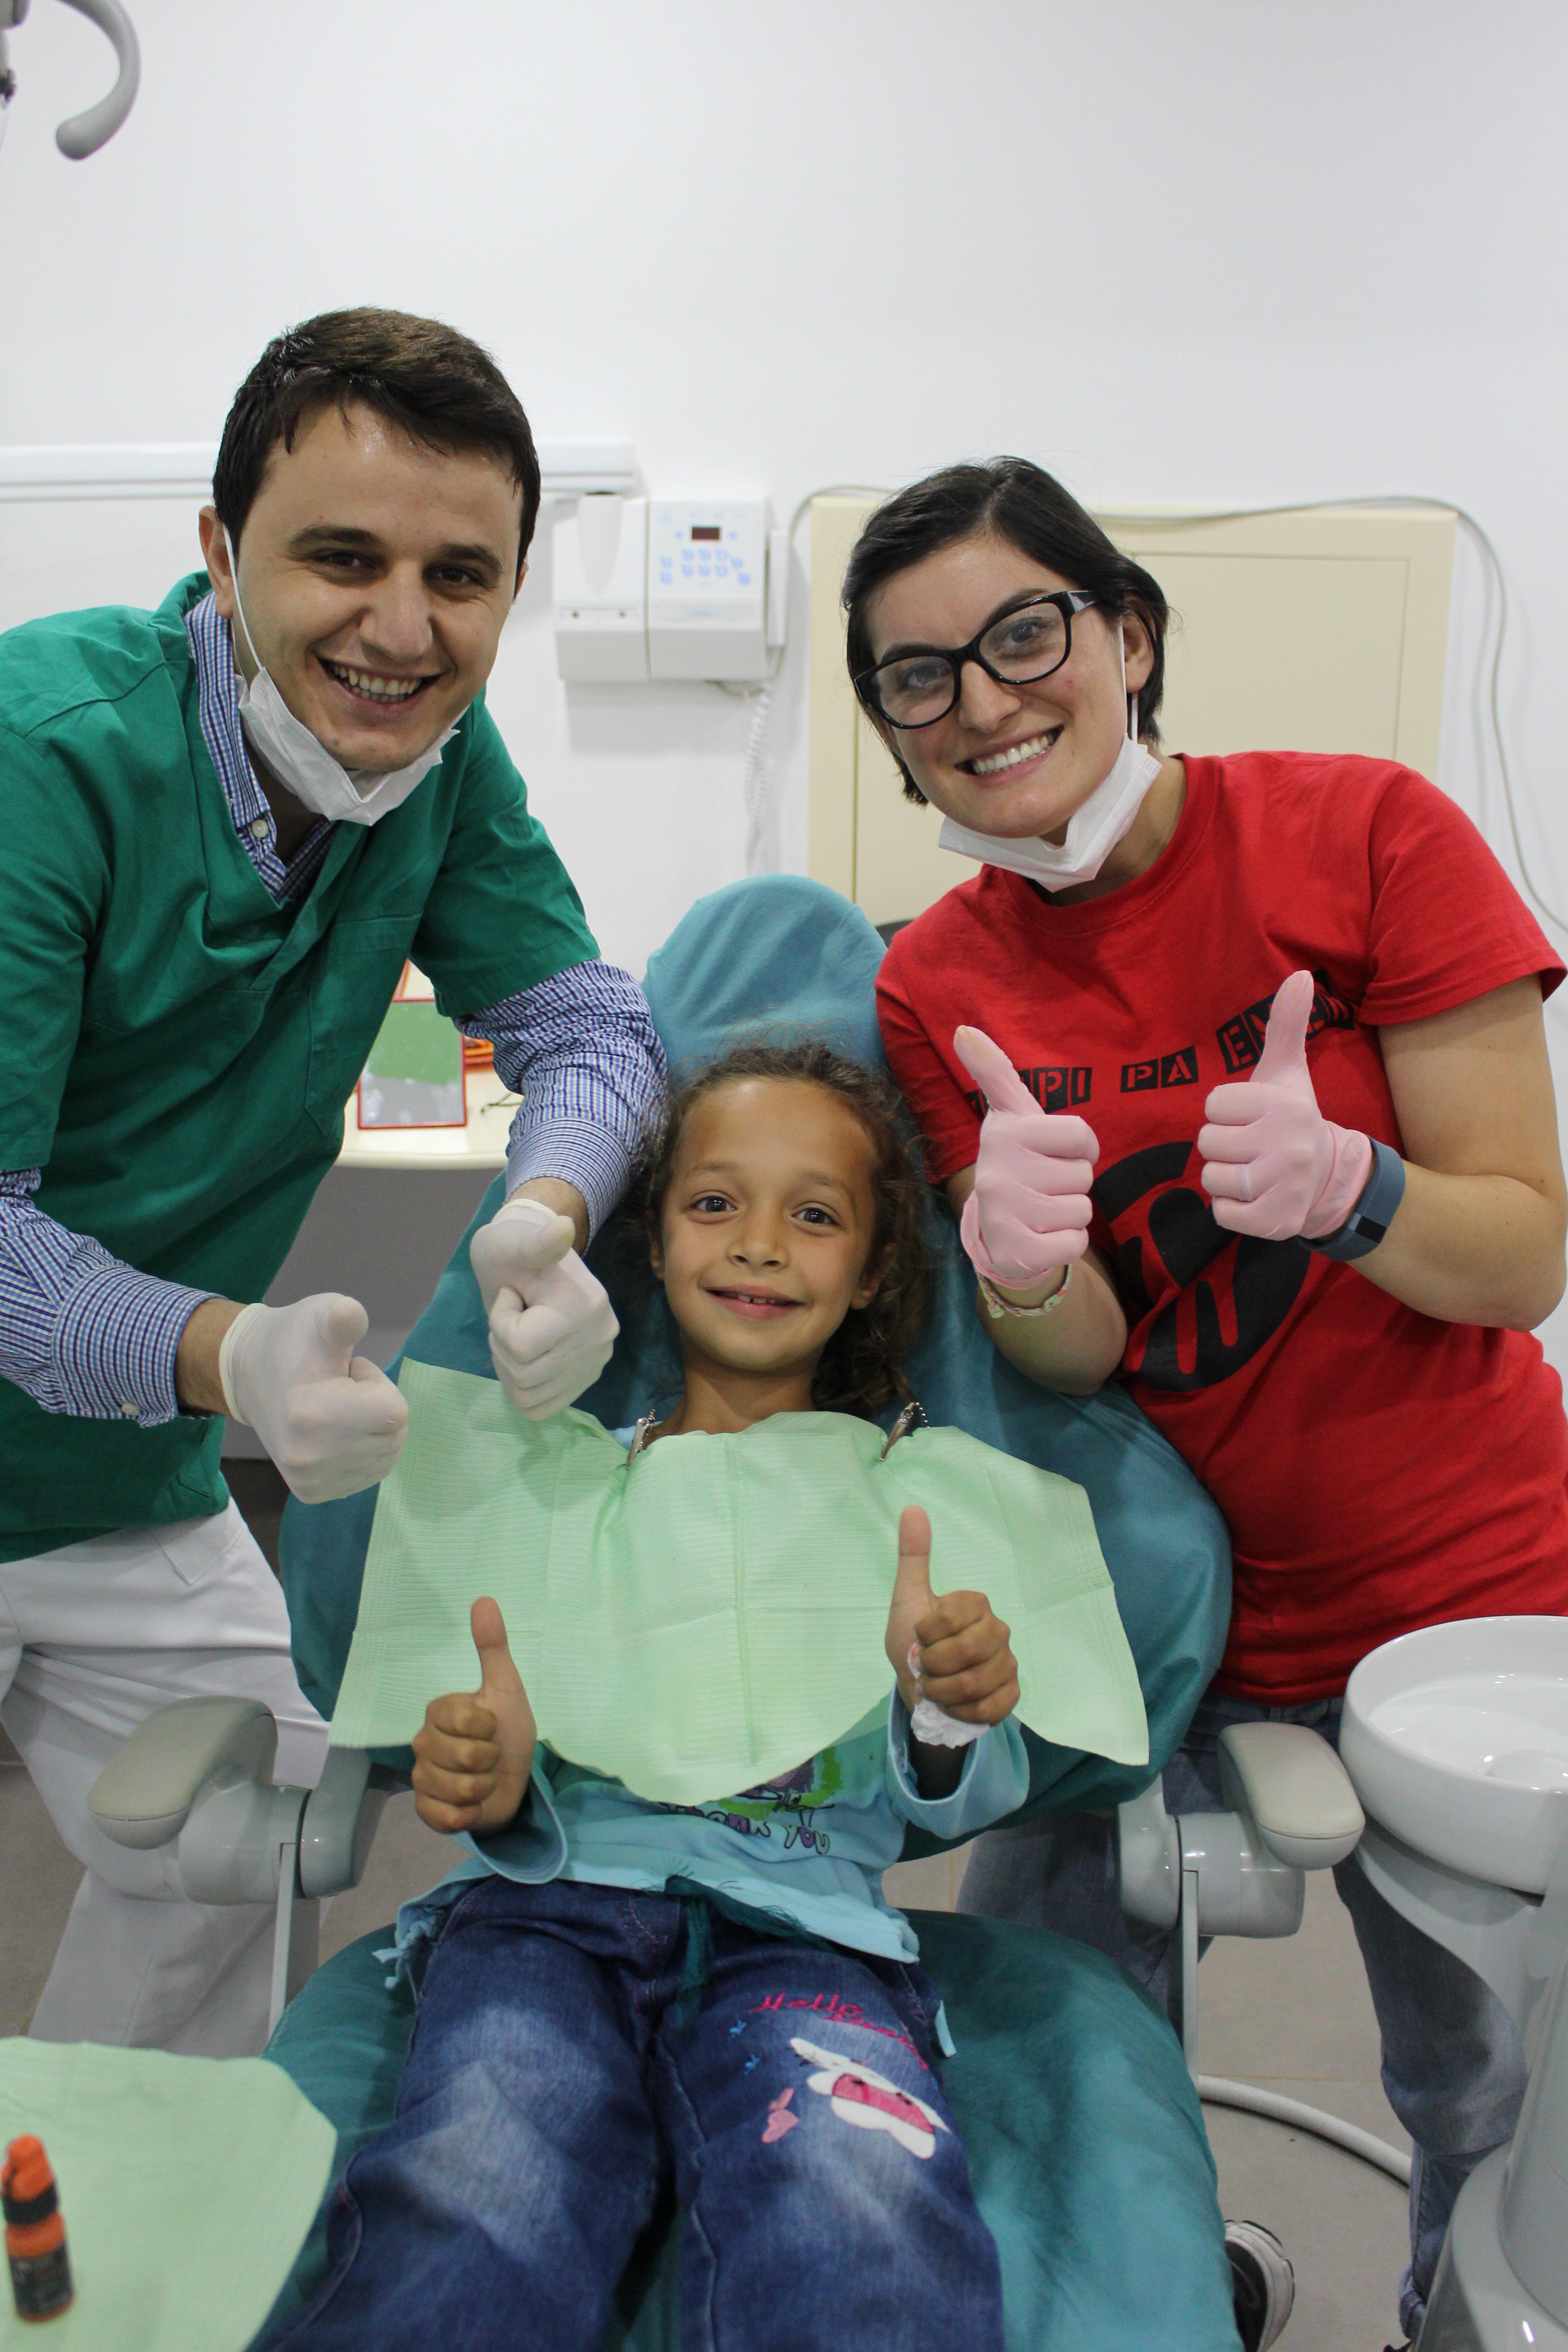 Thumbs up for Luisa's teeth